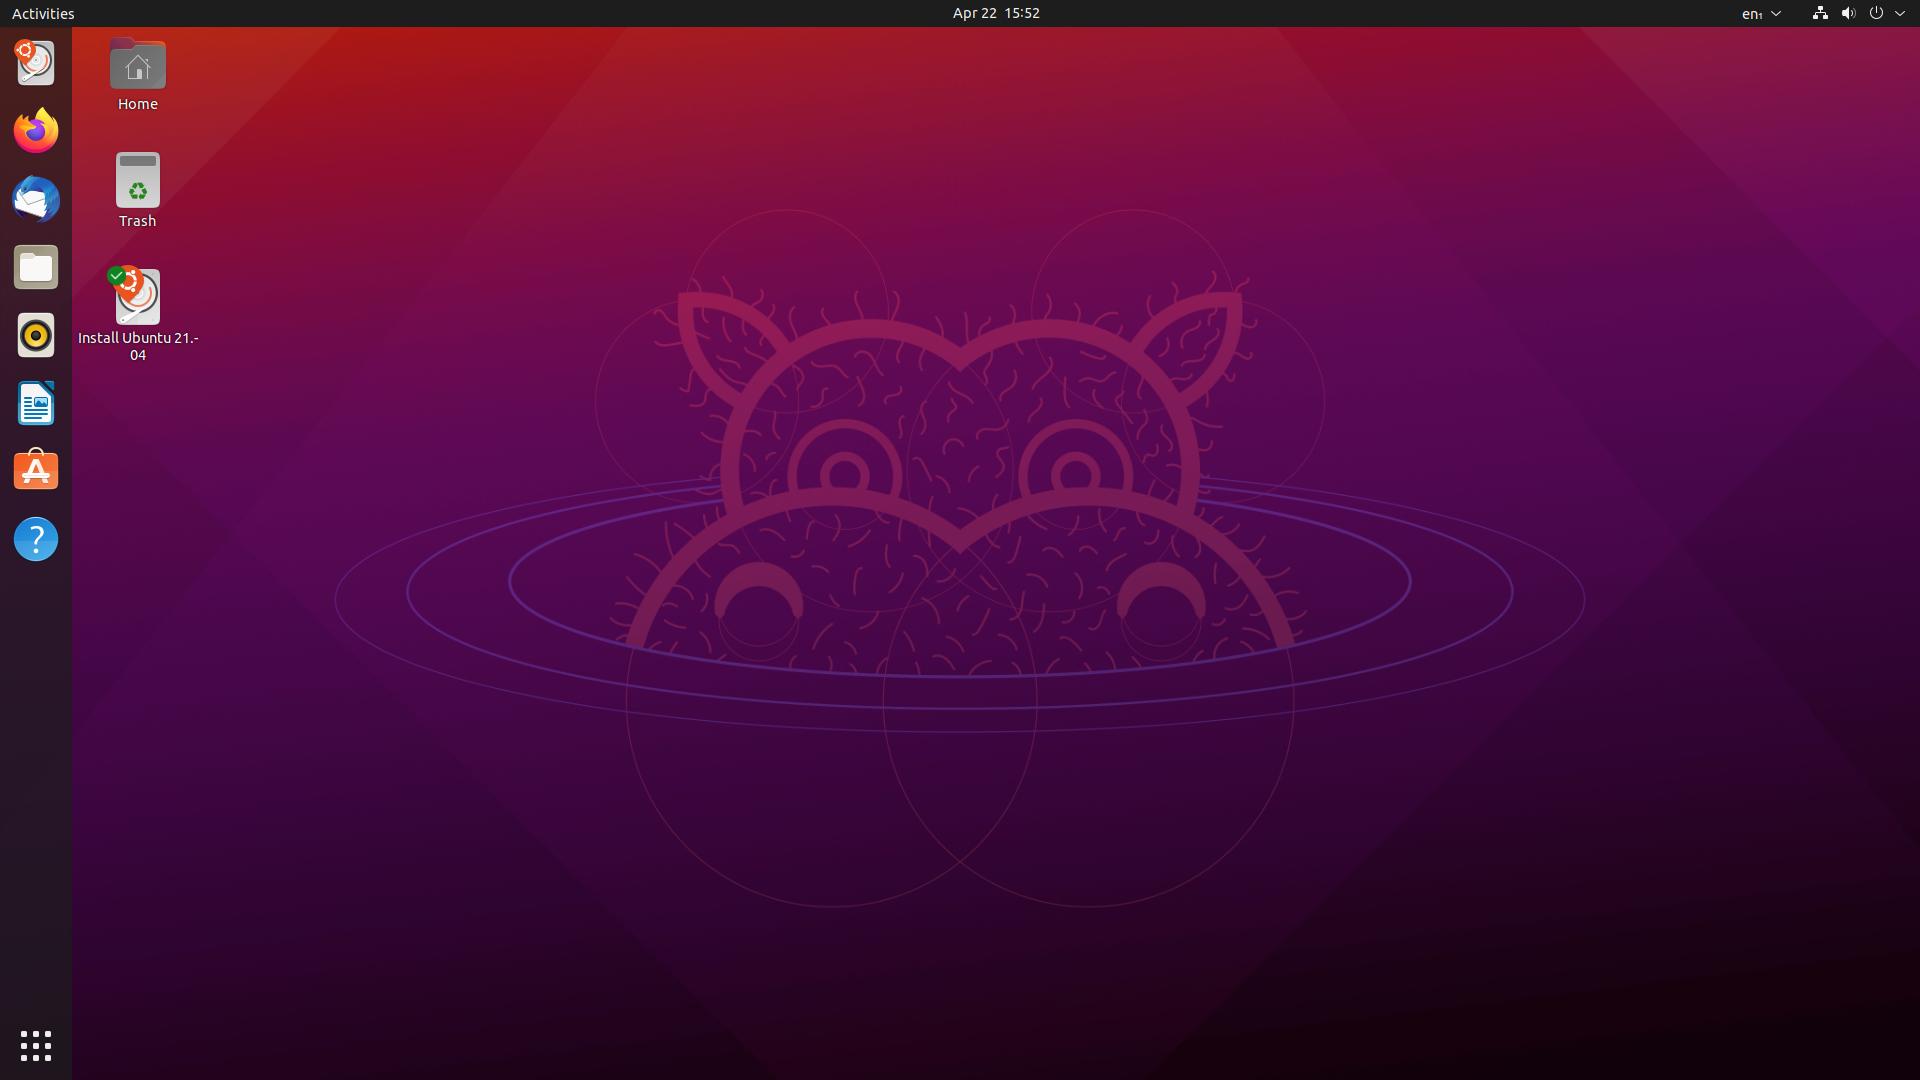 ubuntu-21.04-featured.png